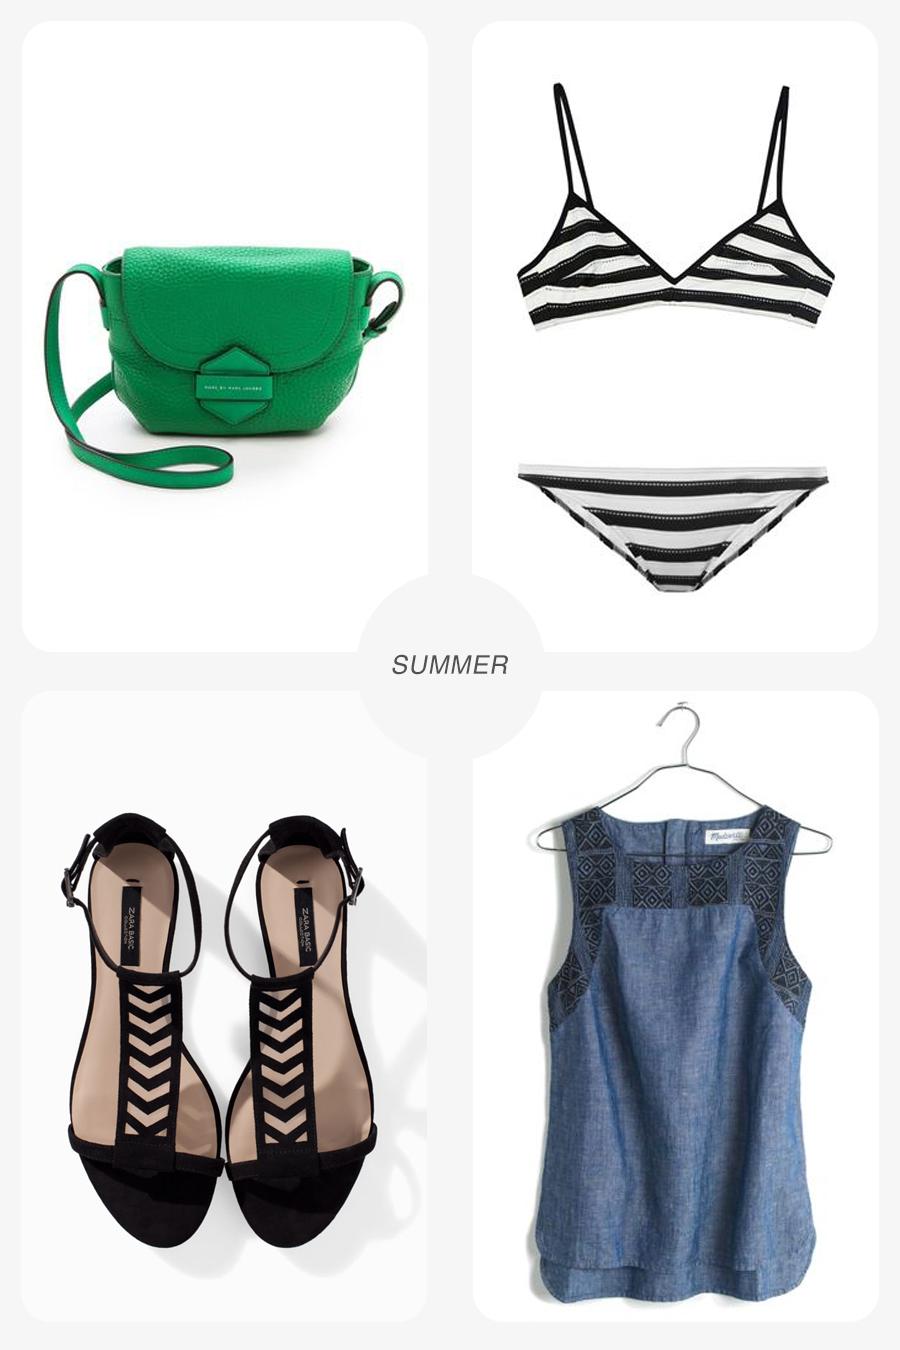 Clockwise from top left: Marc by Marc Jacobs bag/ Shopbop ; Chloe Swimwear/ MatchesFashion ; Linen Shirt/ Madewell ; Lattice sandal/ Zara